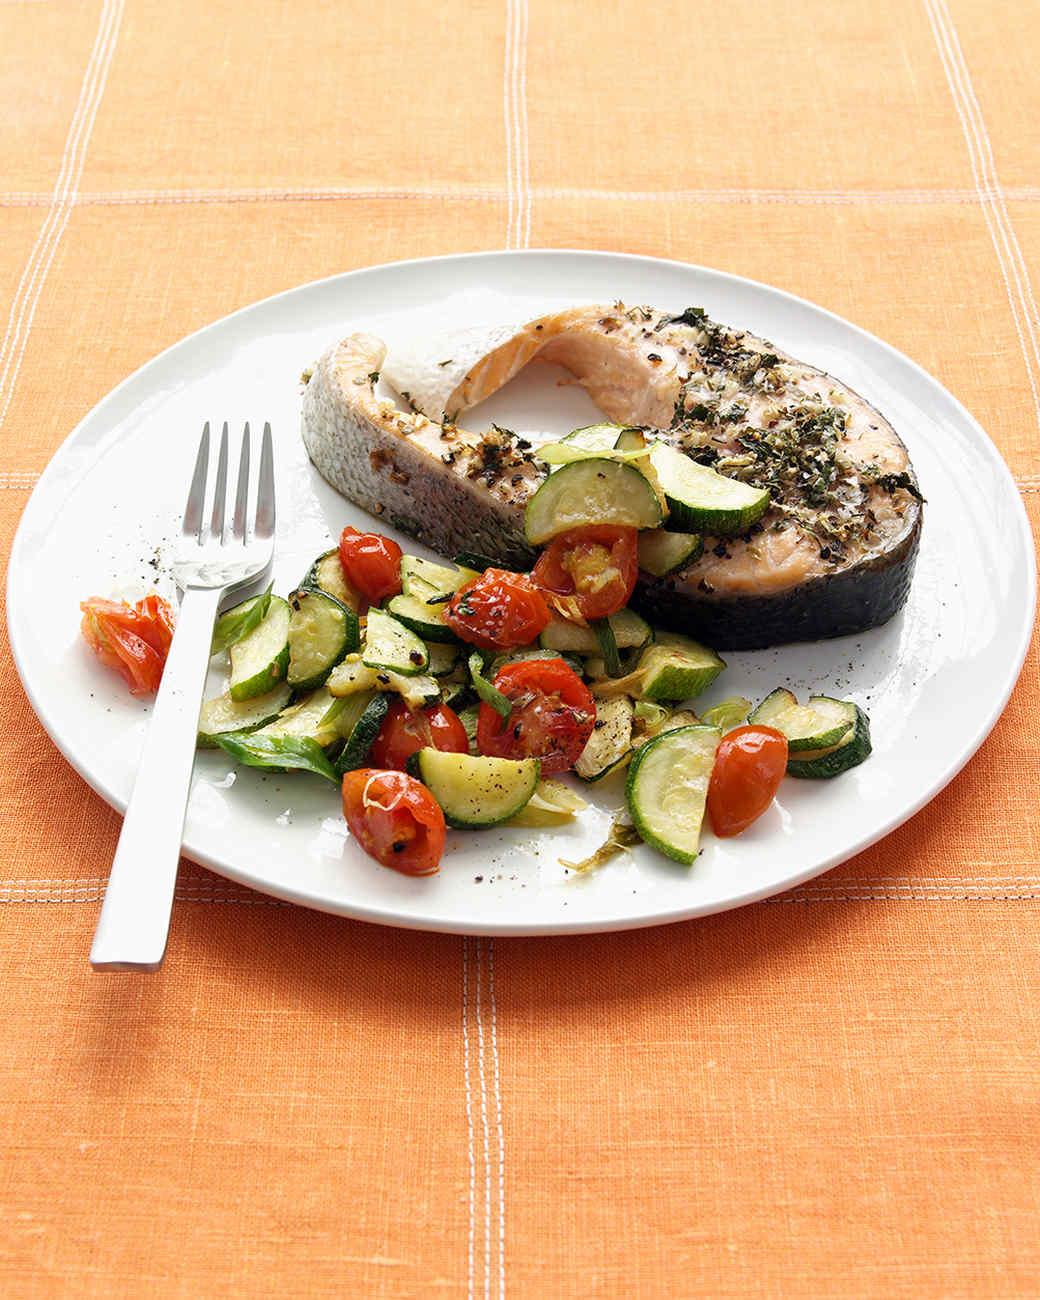 Herb-Rubbed Salmon Steak